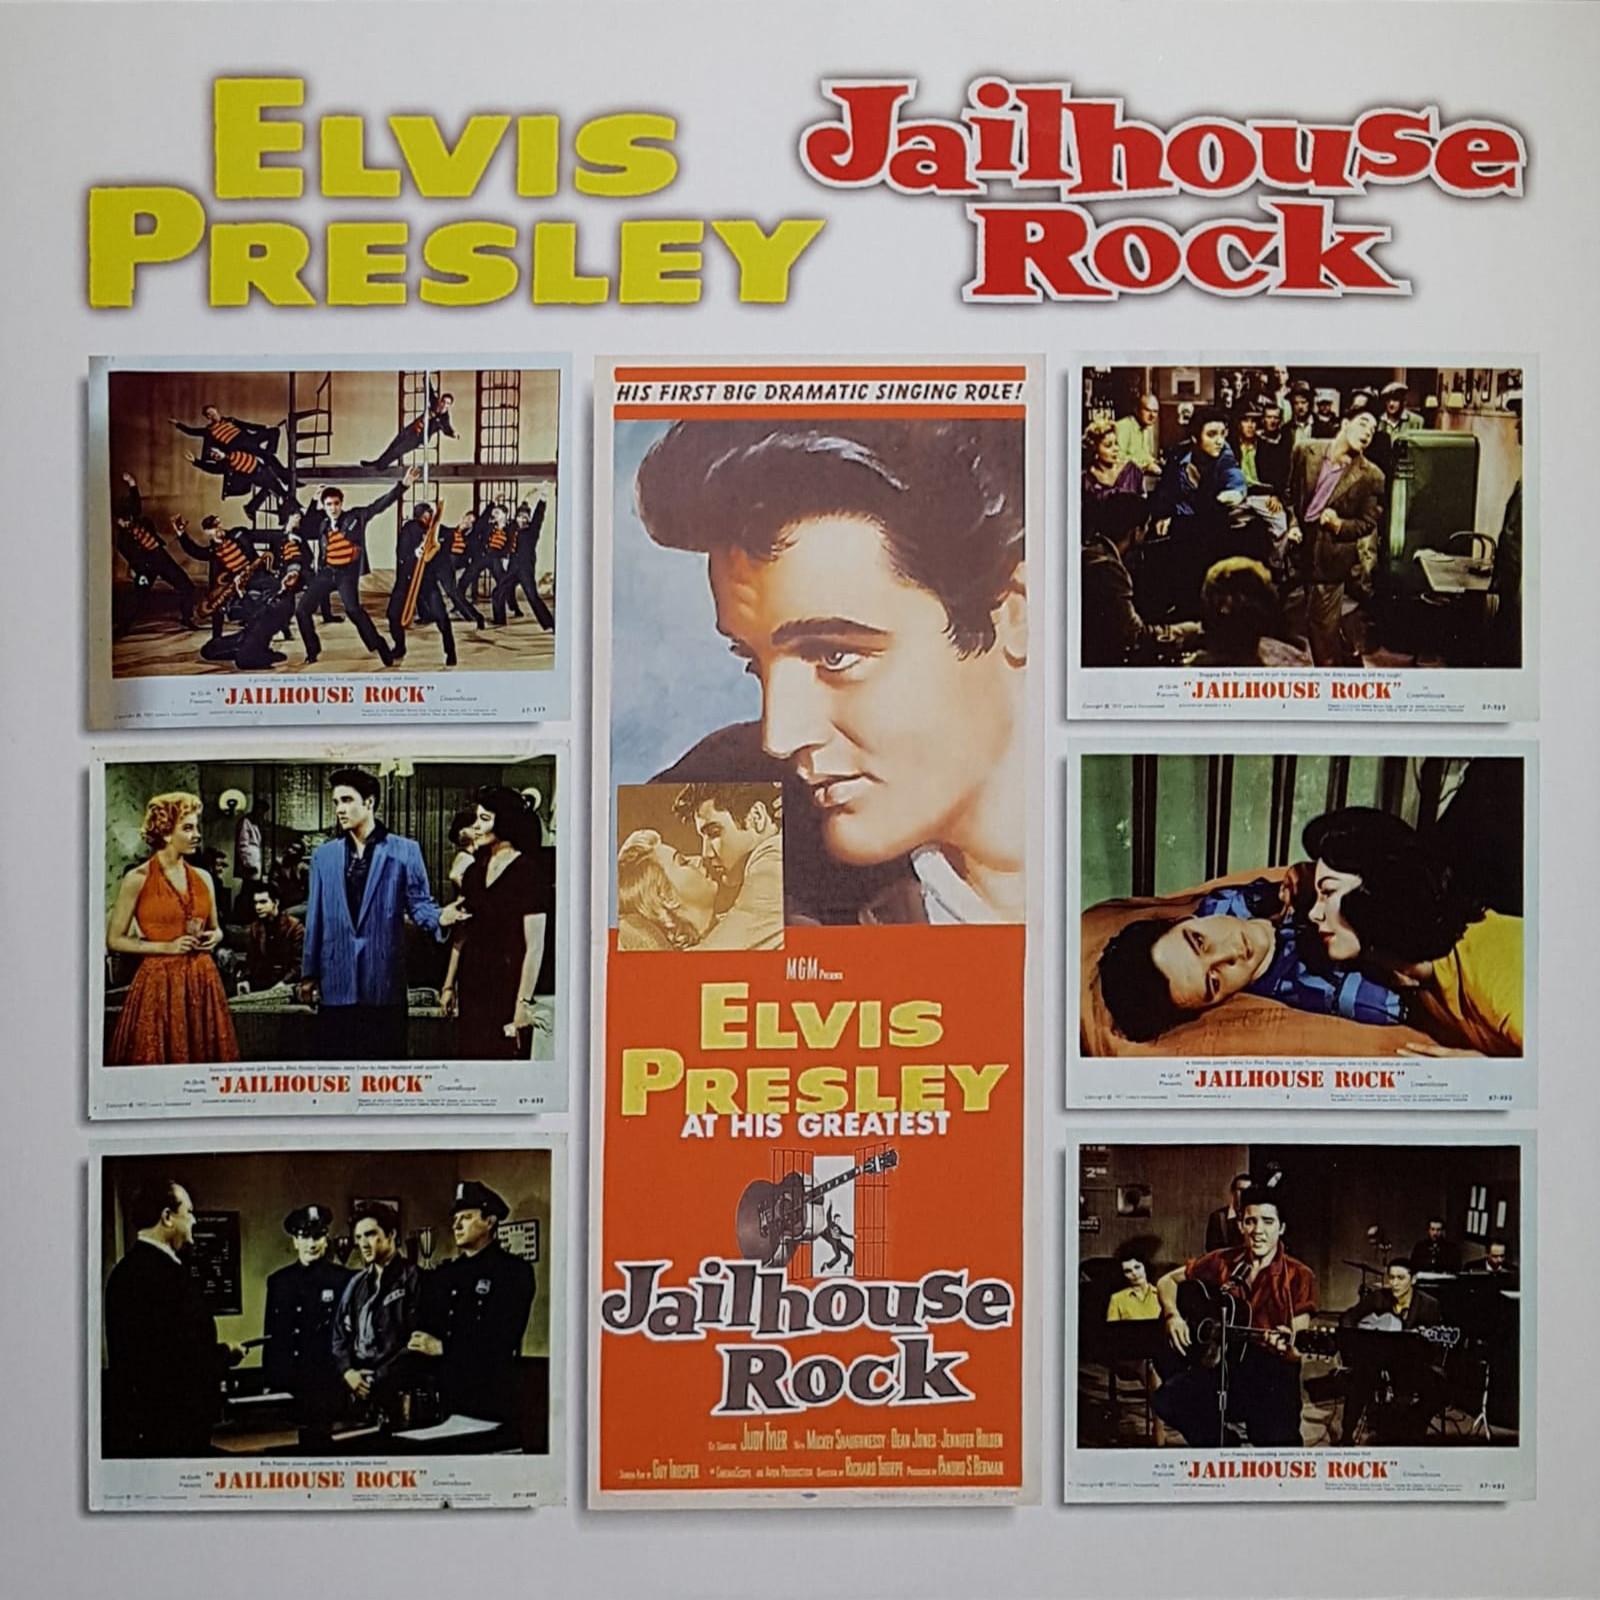 JAILHOUSE ROCK VOL. 2 Jailhouserock02ftd07ajkte